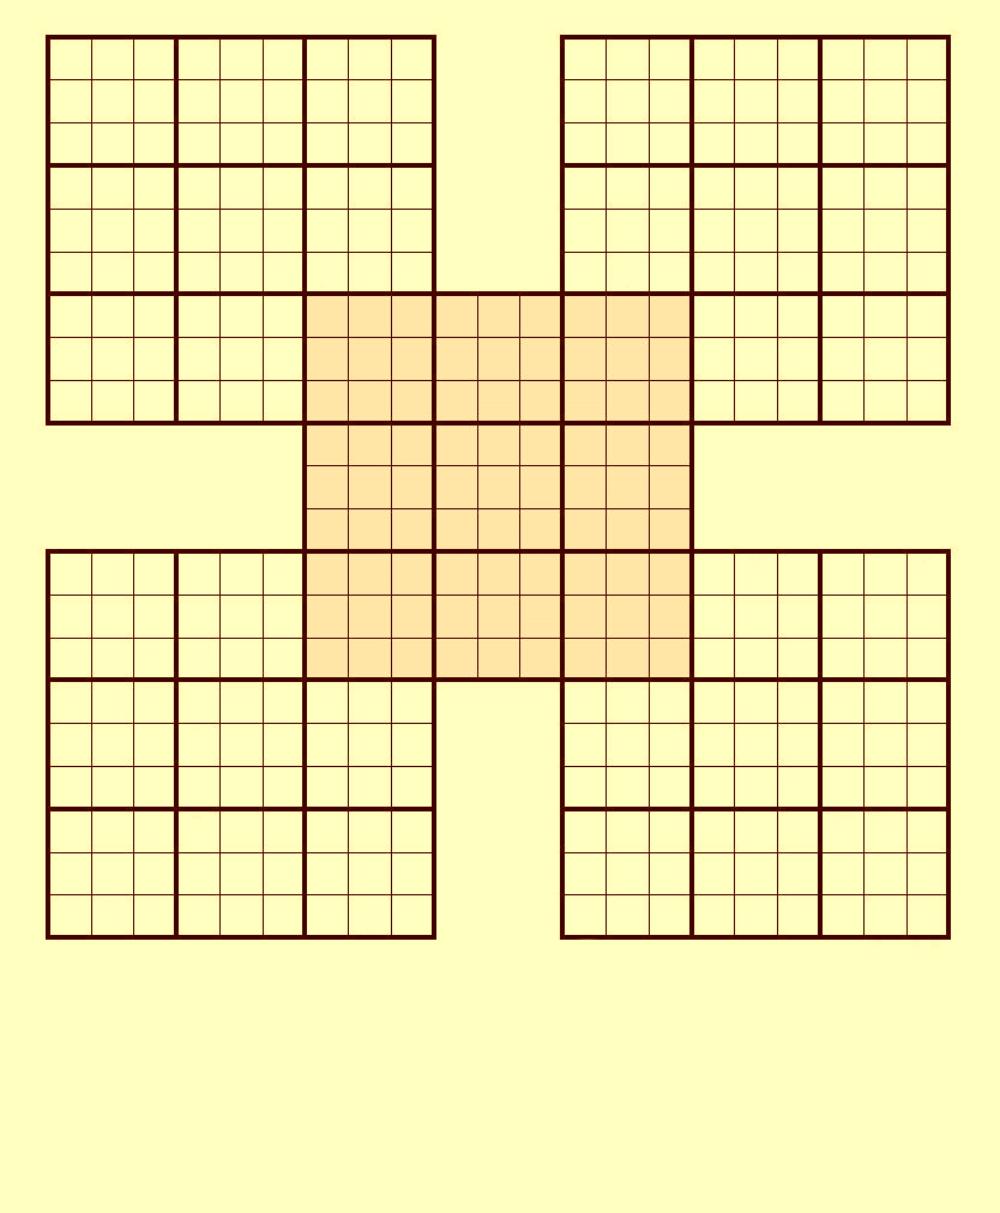 Blank sudoku puzzles jpg